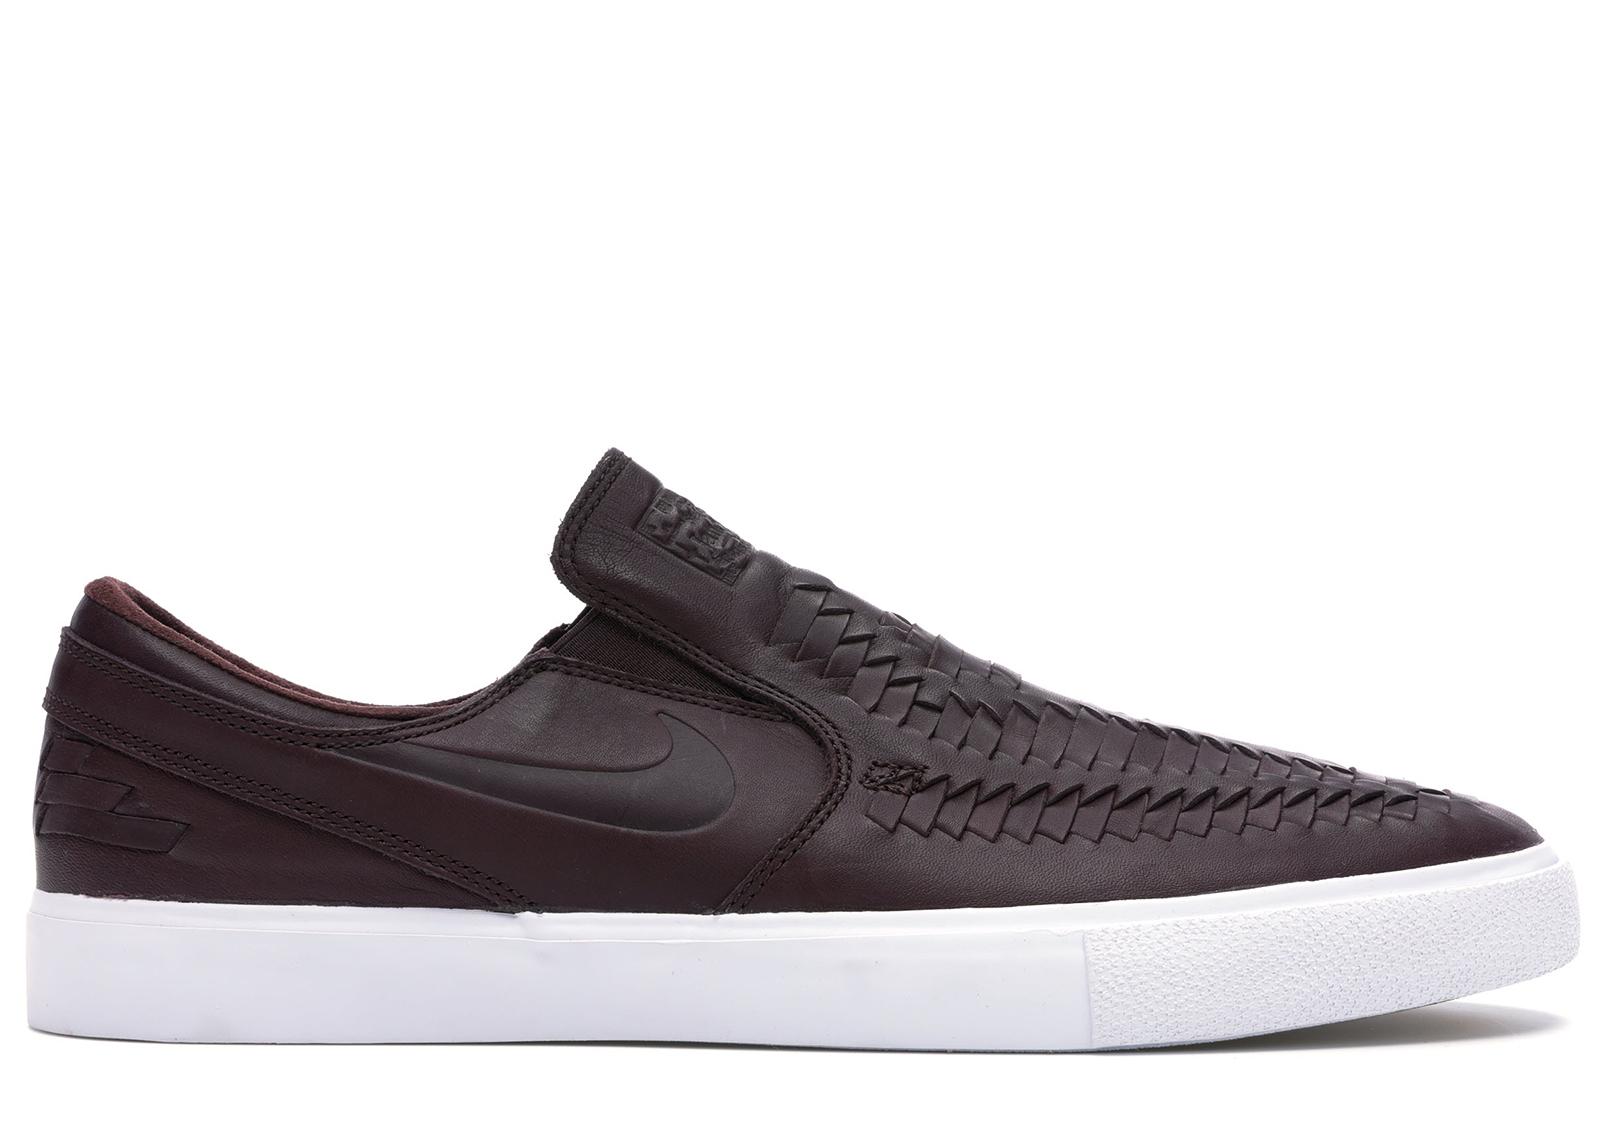 Nike SB Zoom Stefan Janoski Slip RM Crafted Woven Mahogany ...